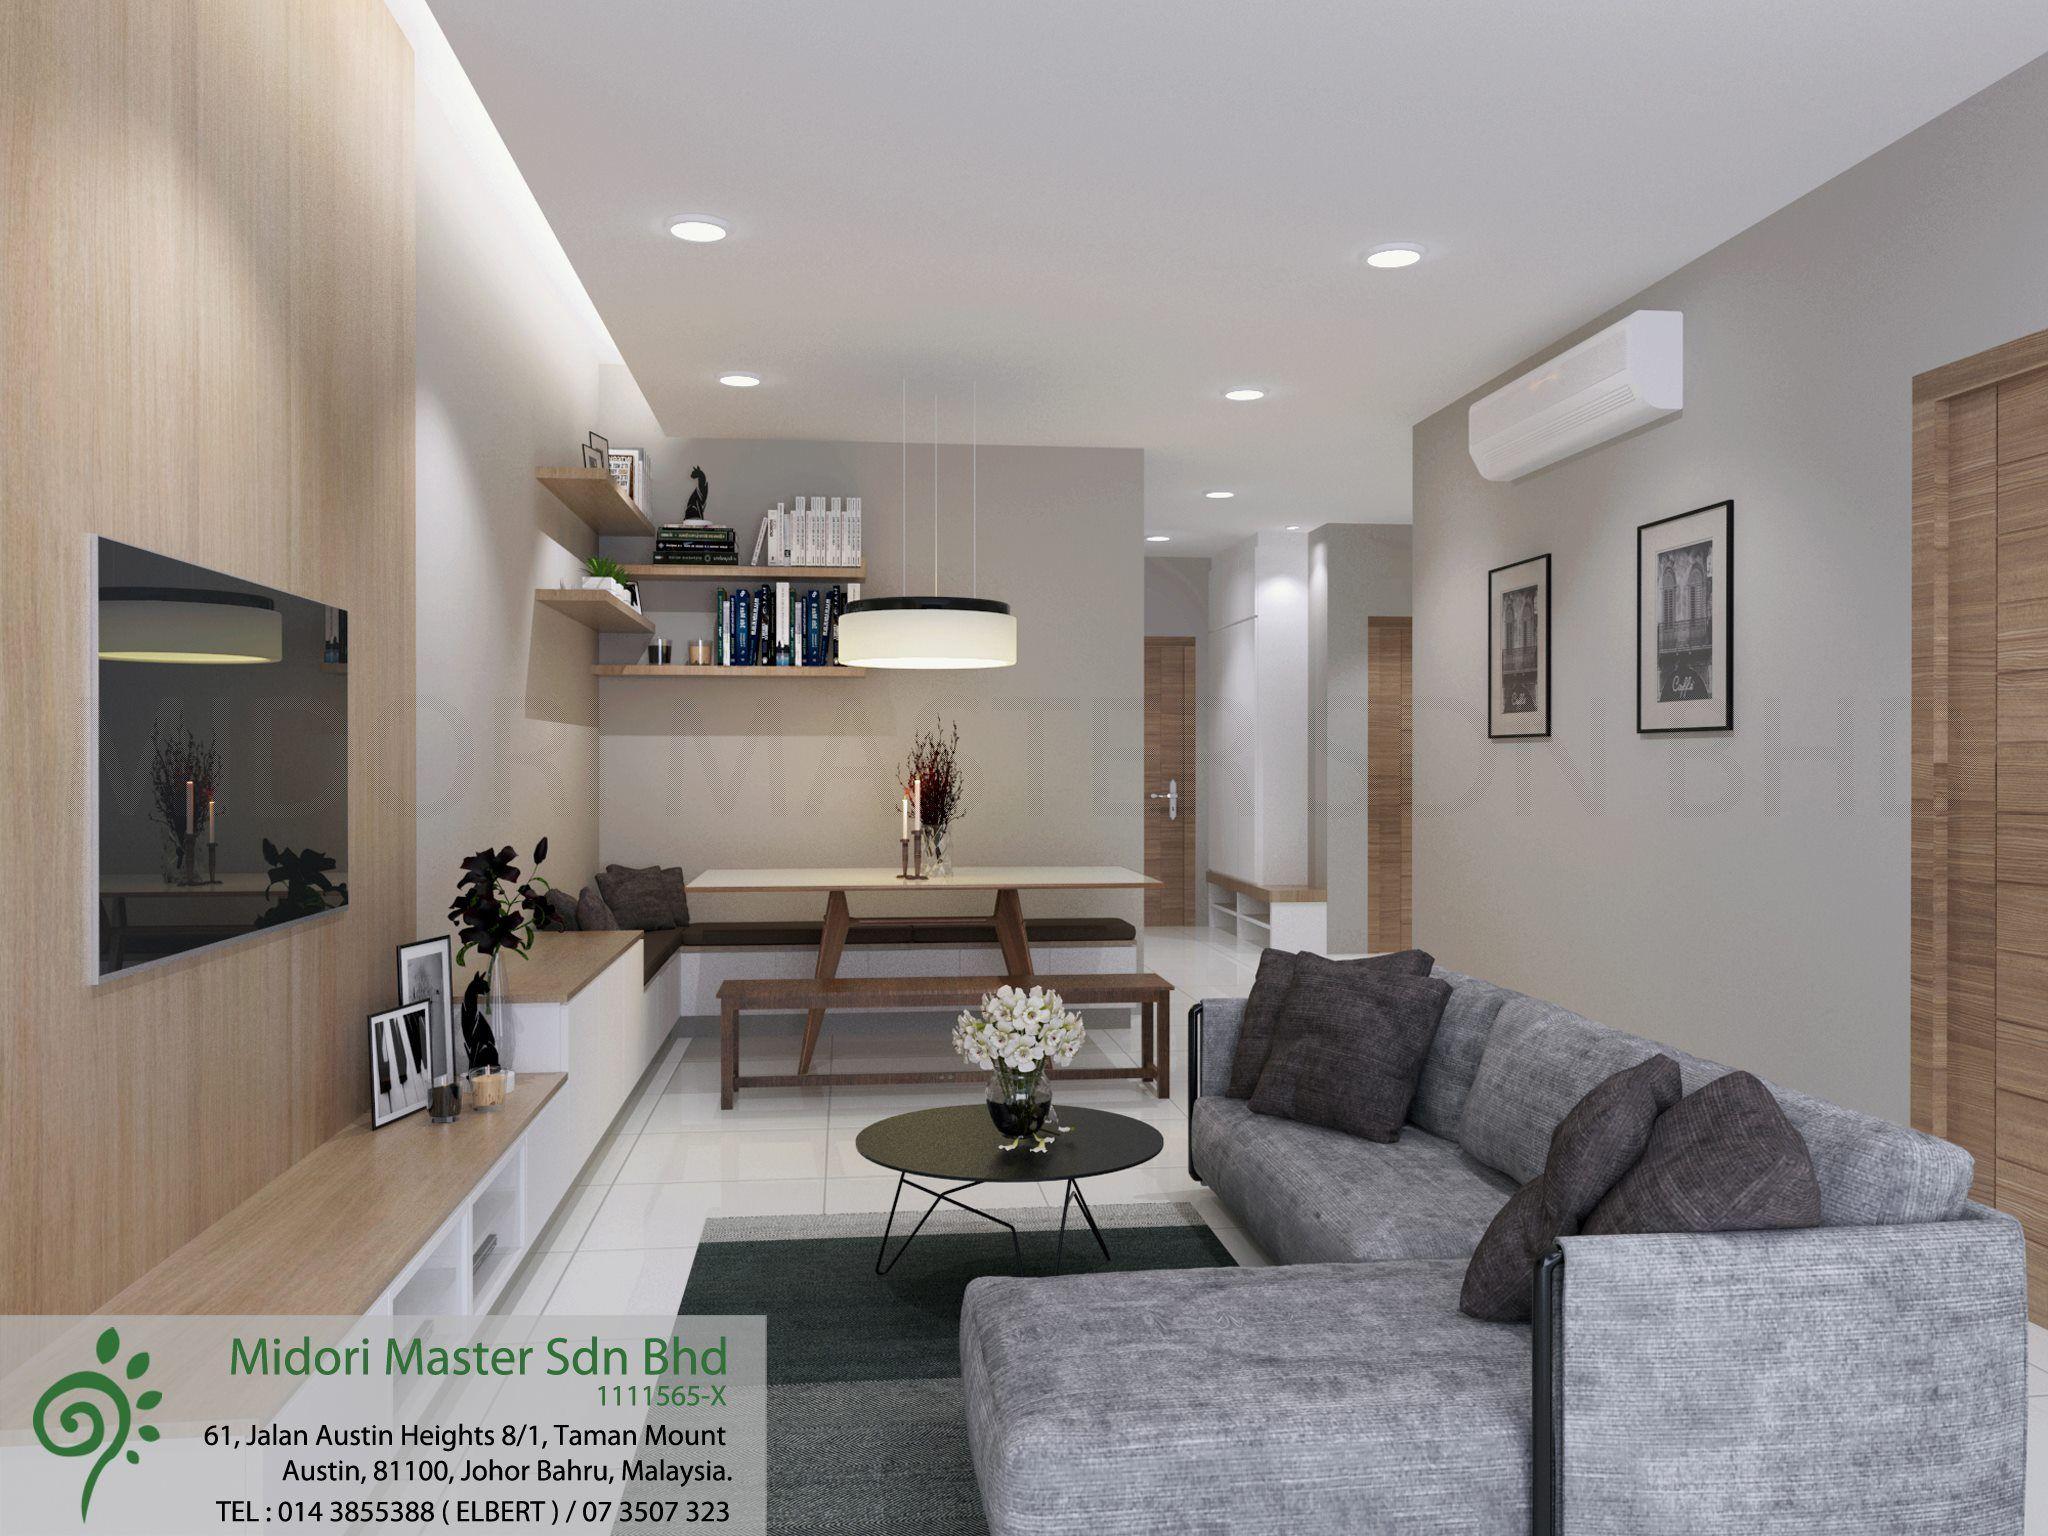 Pin On Interior Design Malaysia living room ideas